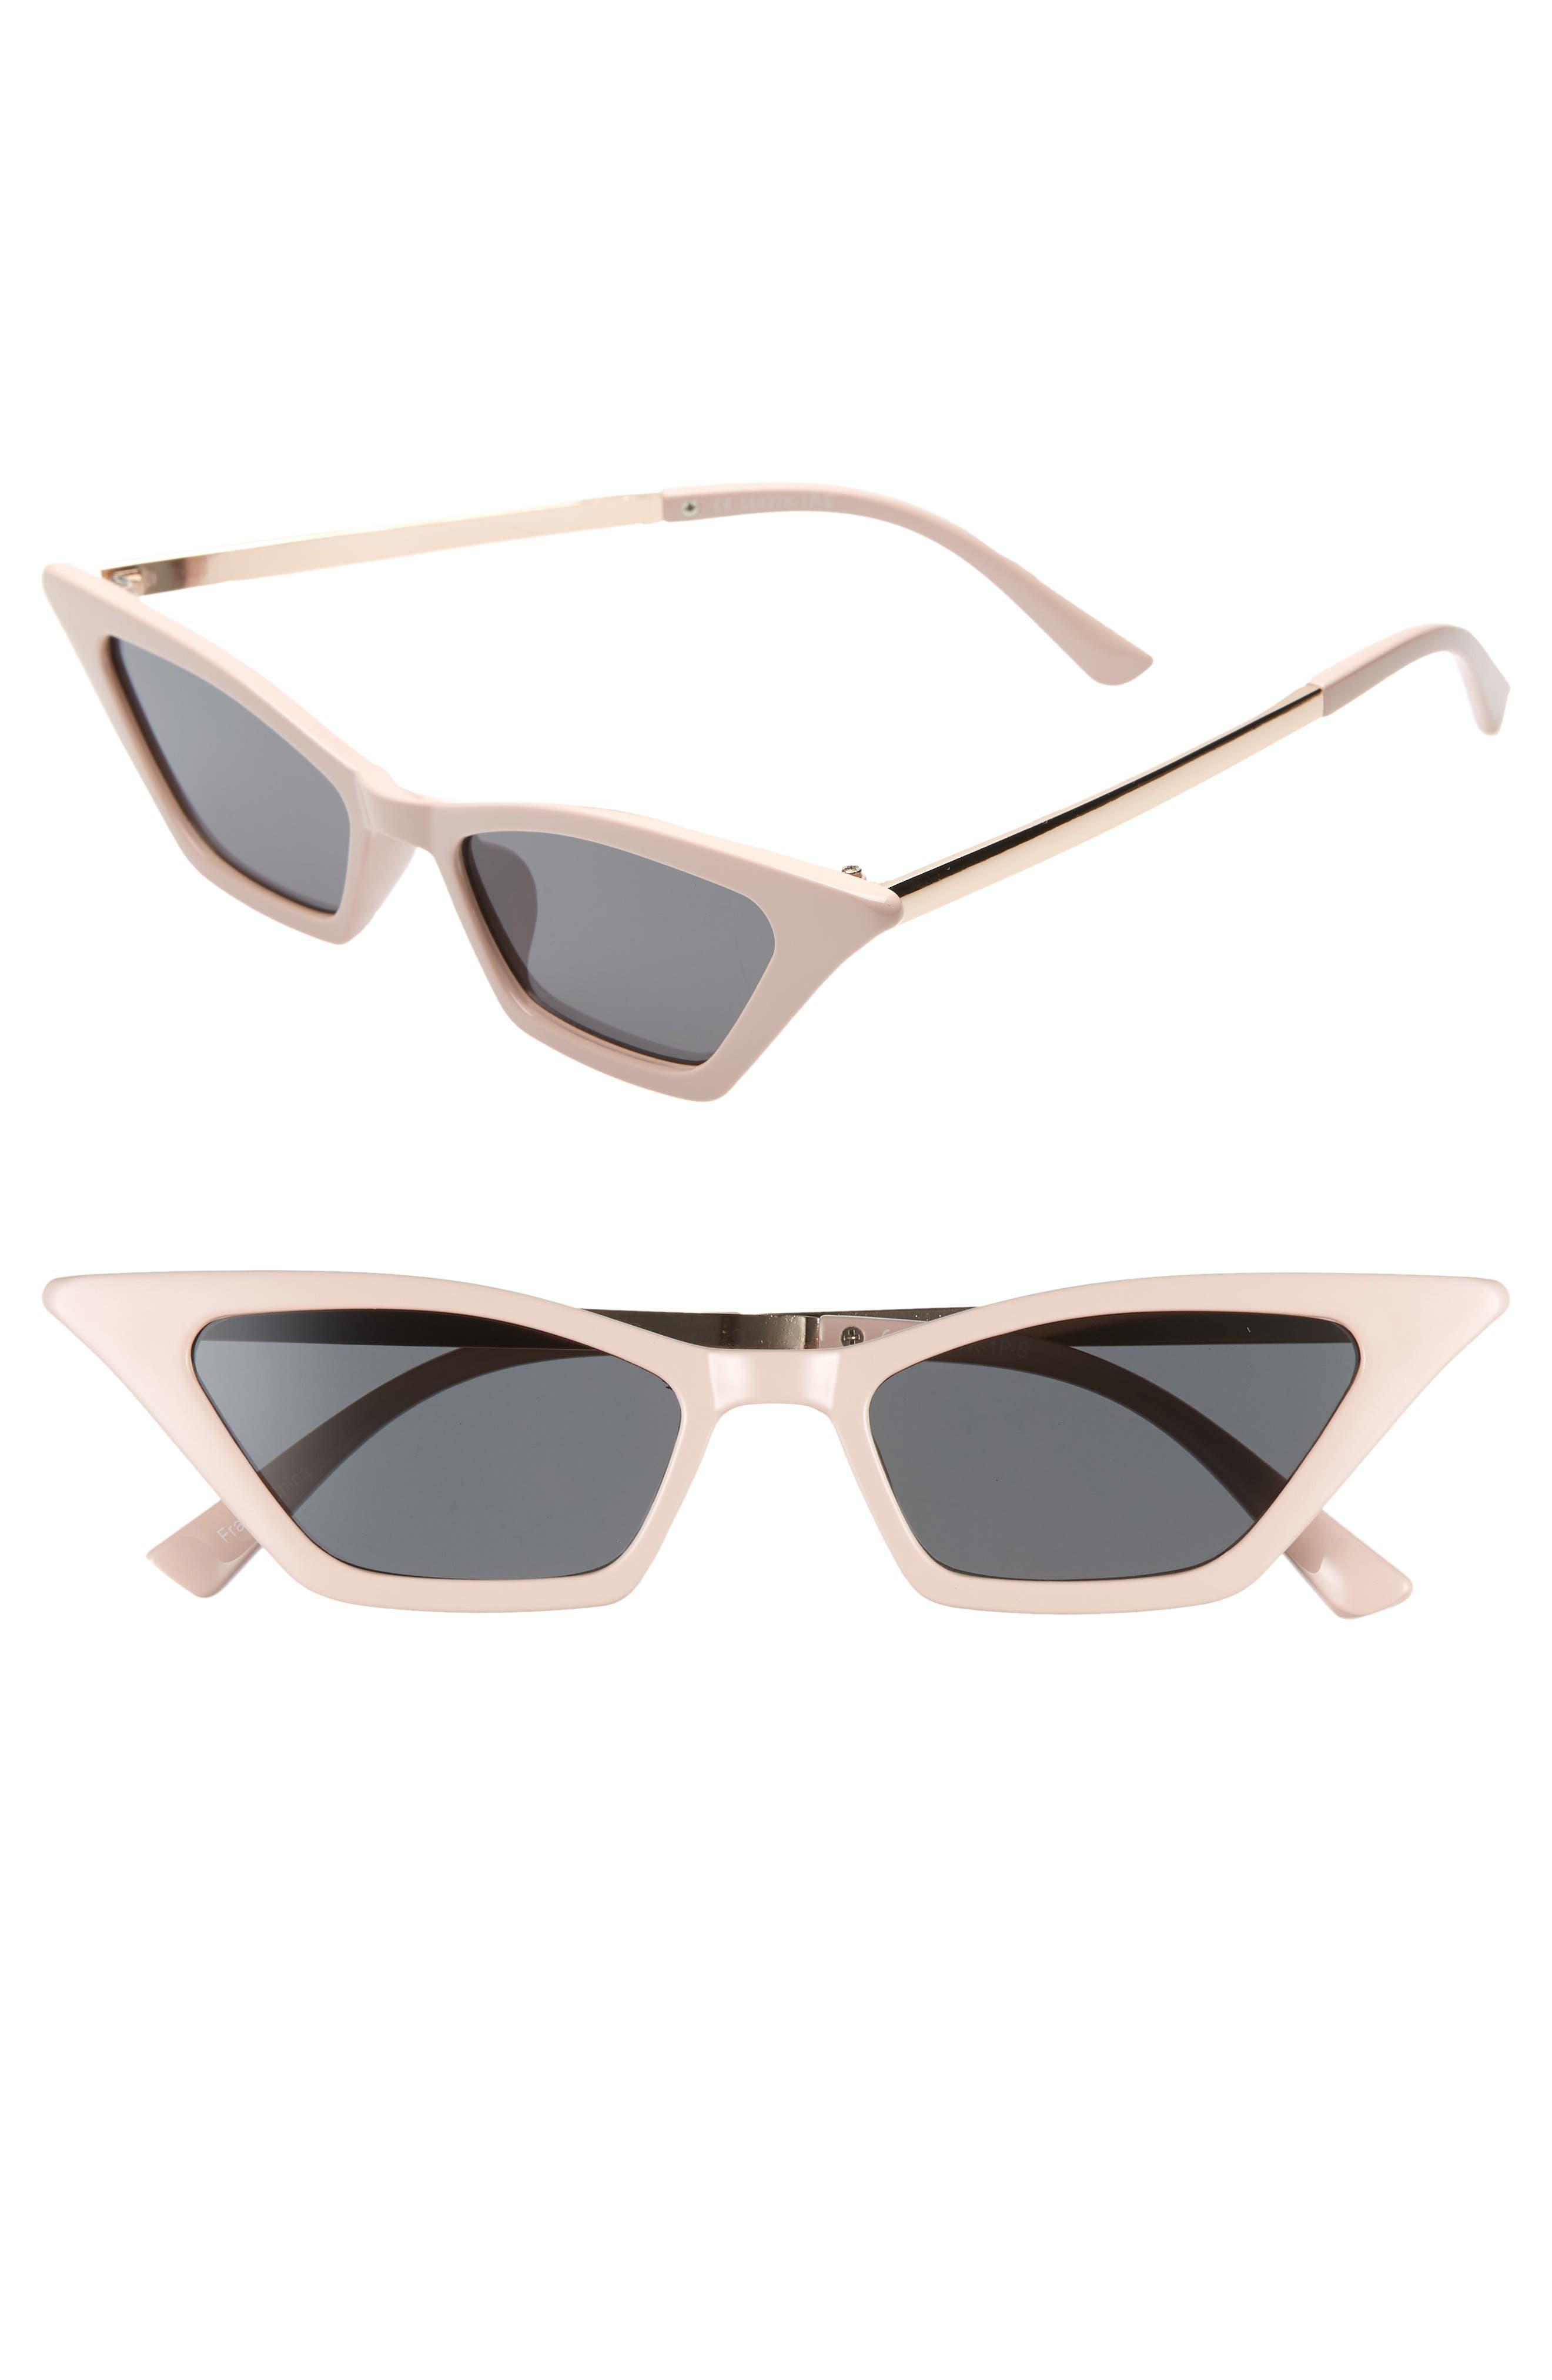 BP. 47mm Mini Cat Eye Sunglasses,                             Main thumbnail 1, color,                             GOLD/ PINK